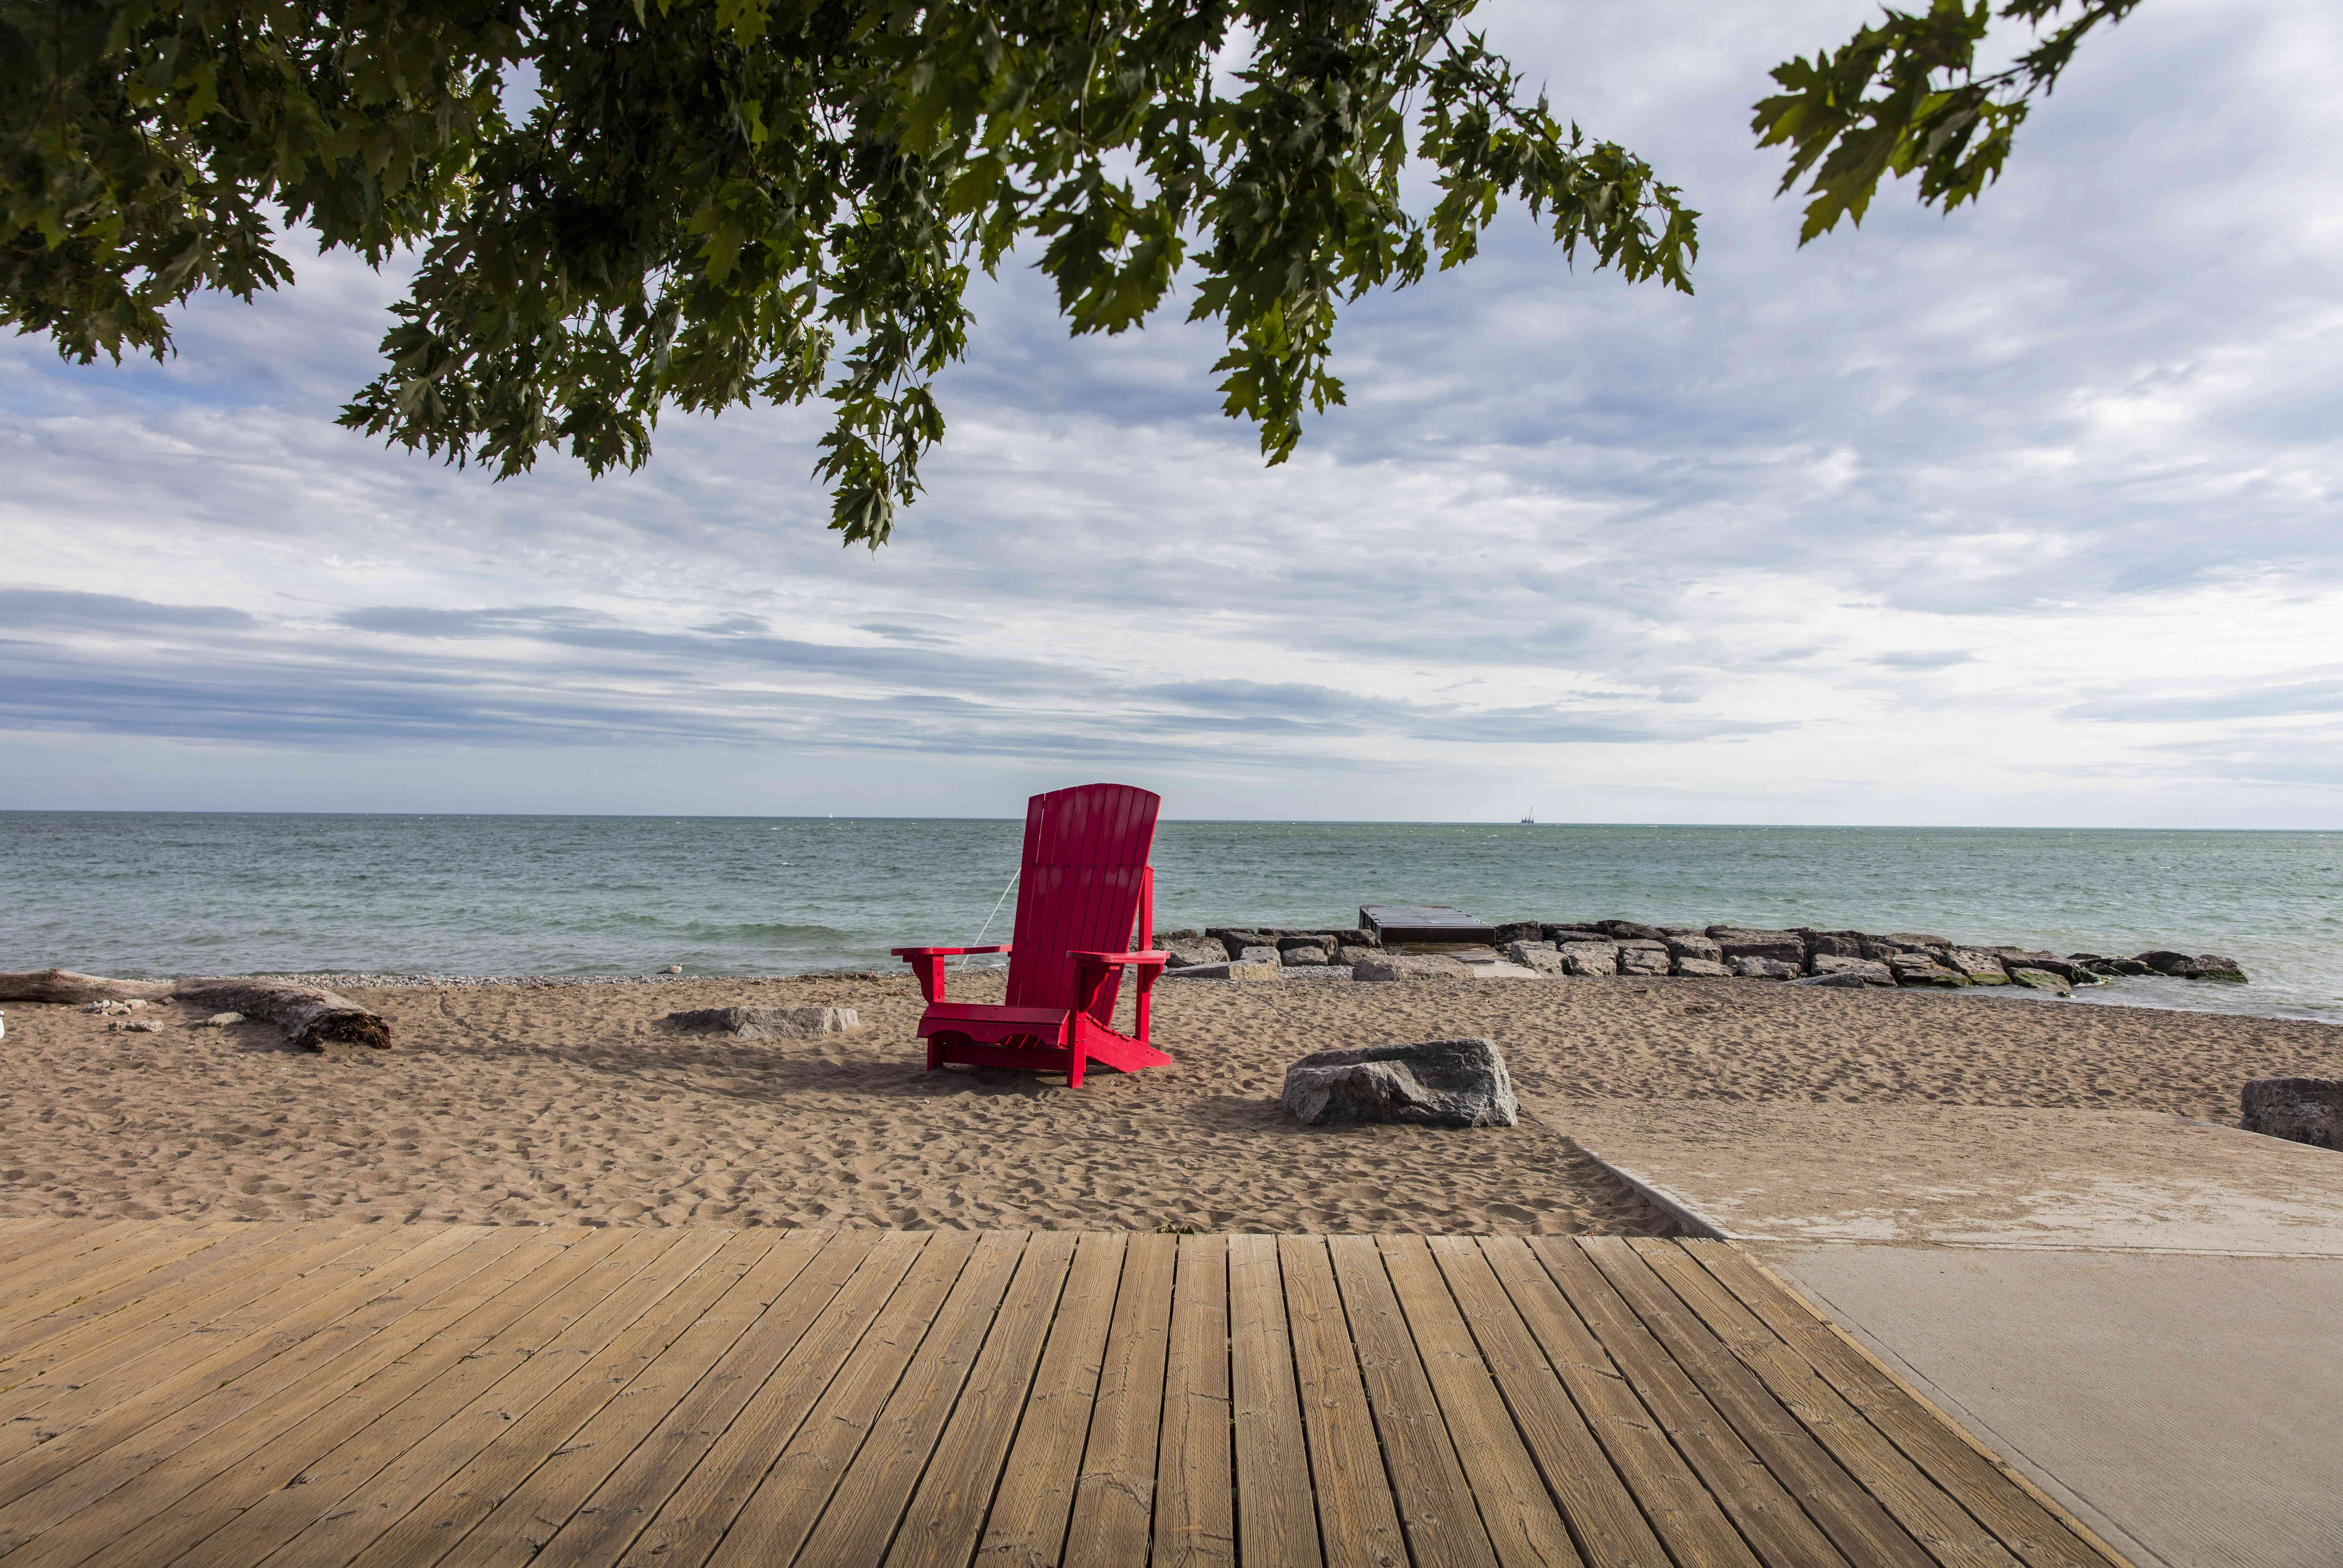 Kew Balmy Beach in Toronto